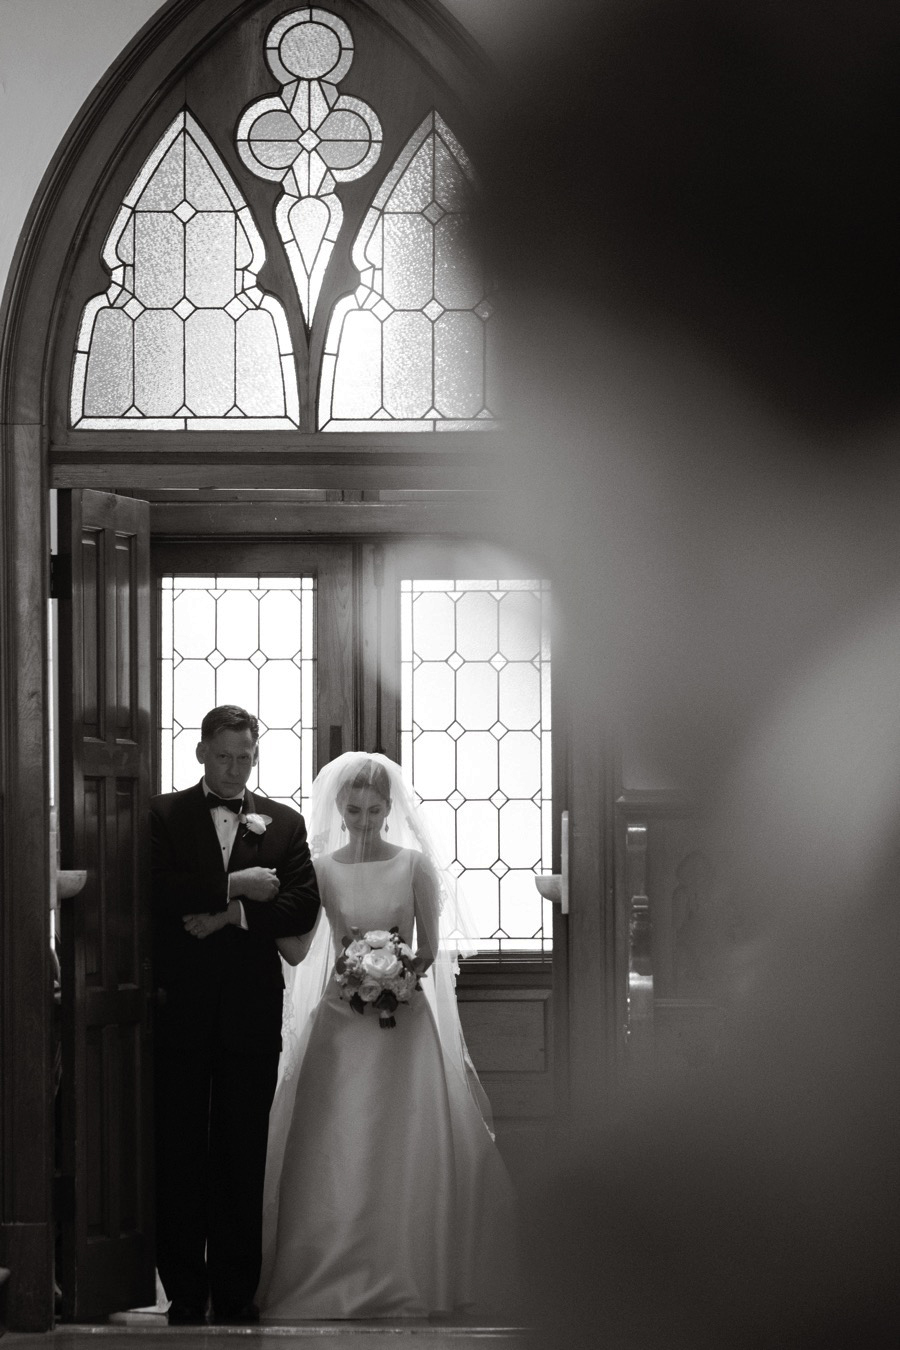 Sacred HEART CHAPEL WEDDING.  New Orleans Louisiana. Eau Claire Photographics.